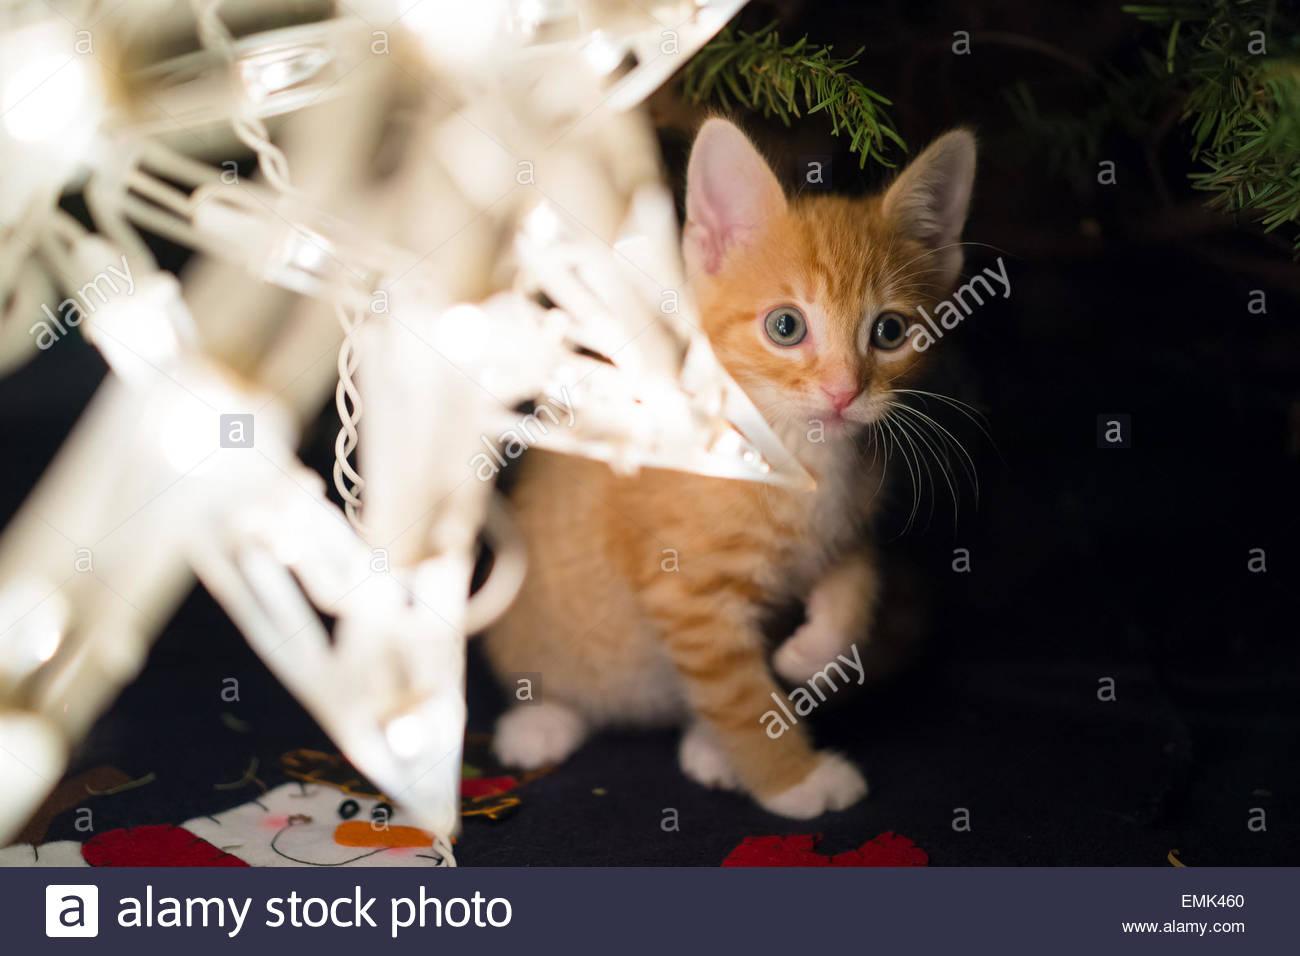 Cat under christmas tree - Stock Image